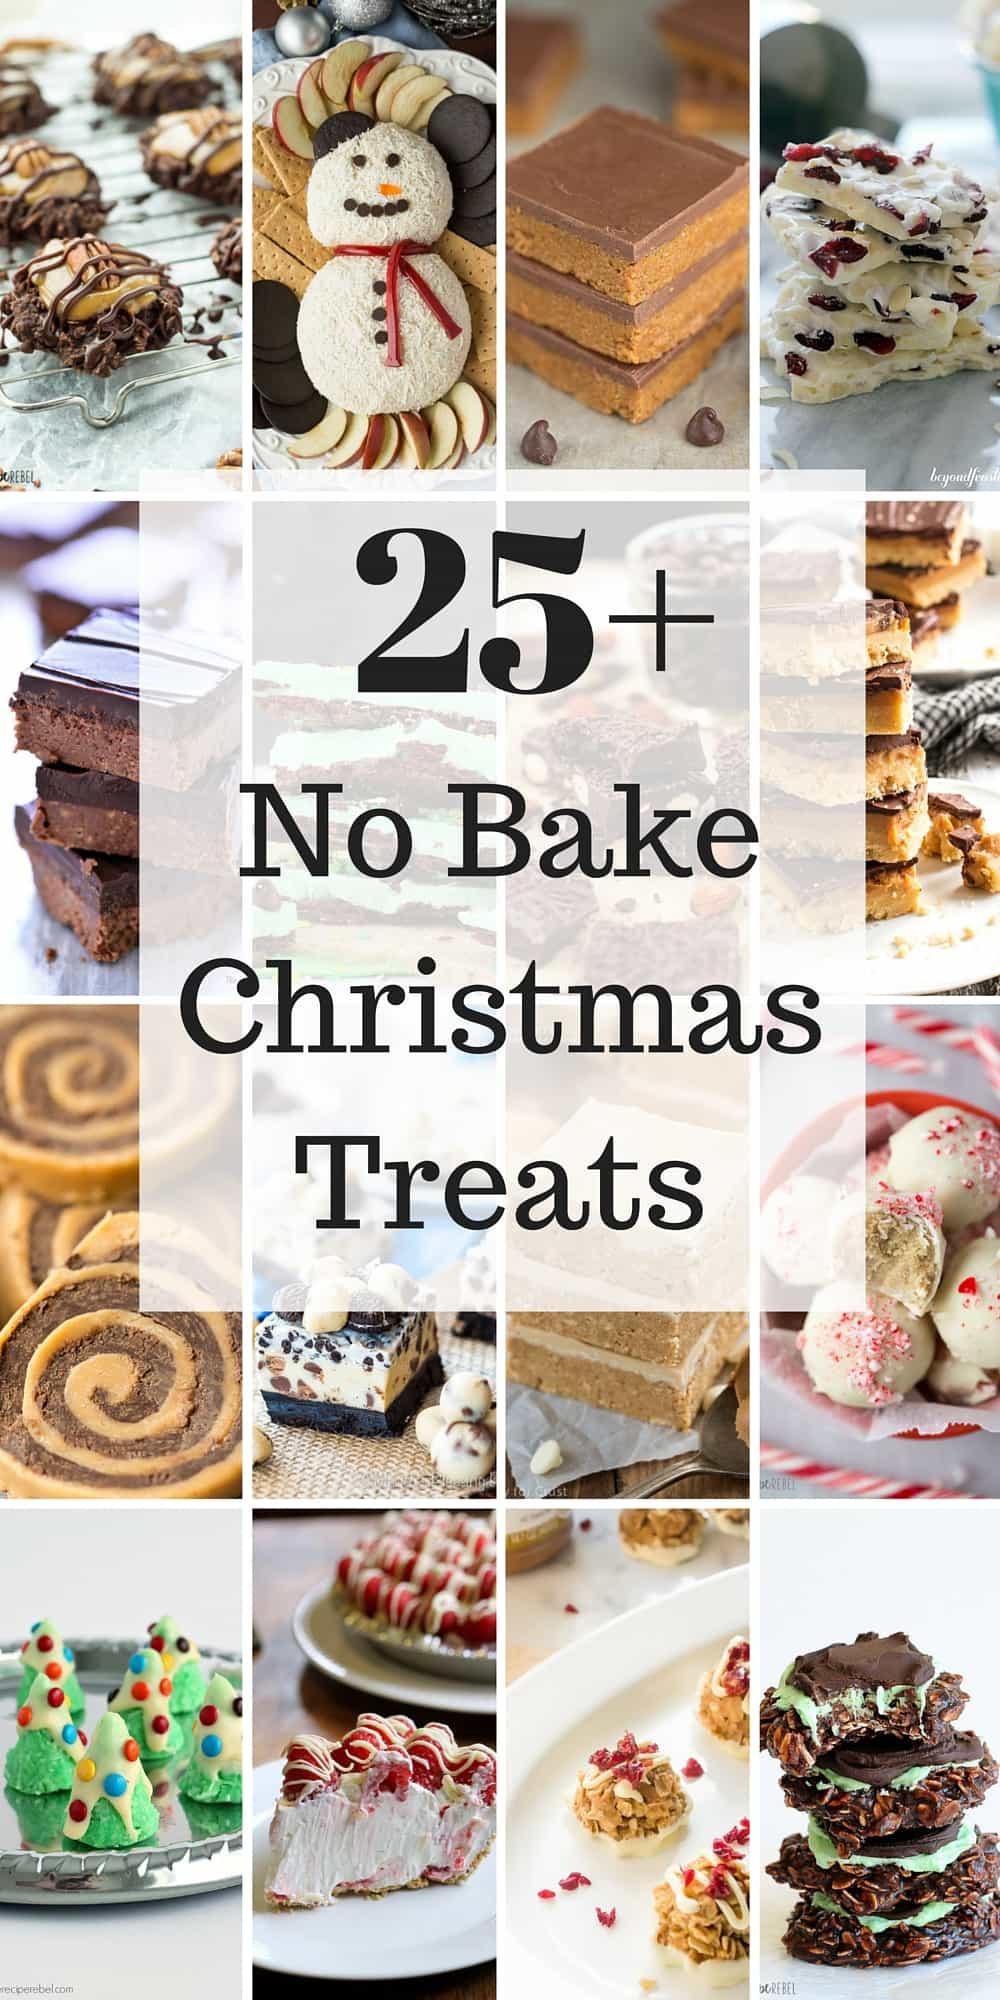 No Baking Christmas Treats  25 No Bake Christmas Treats Easy Christmas cookies